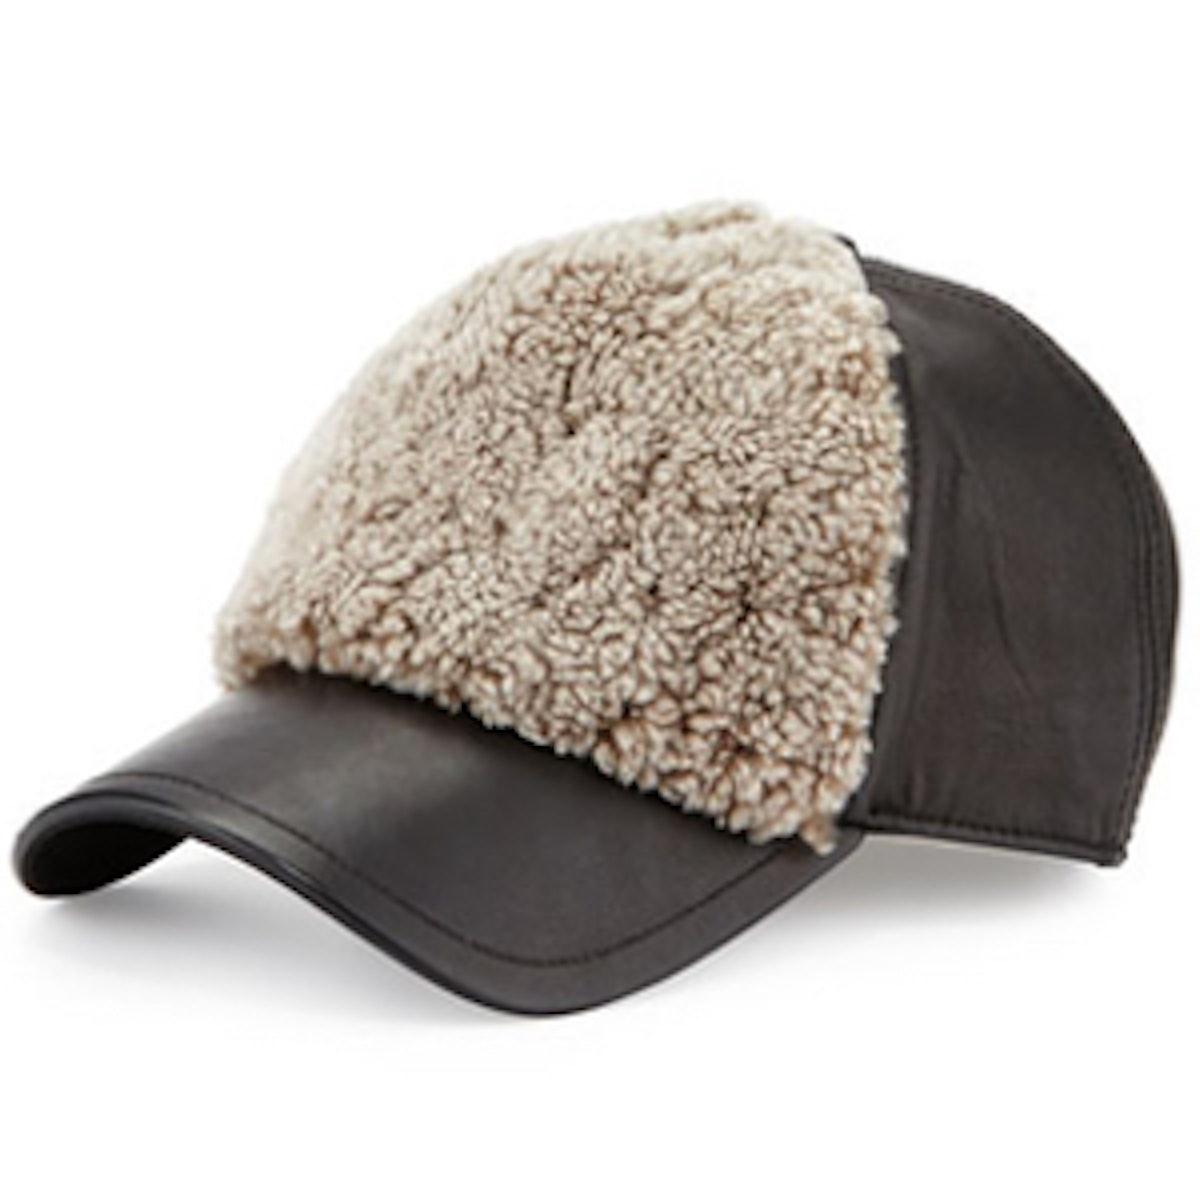 Marilyn Leather & Shearling Fur Baseball Cap